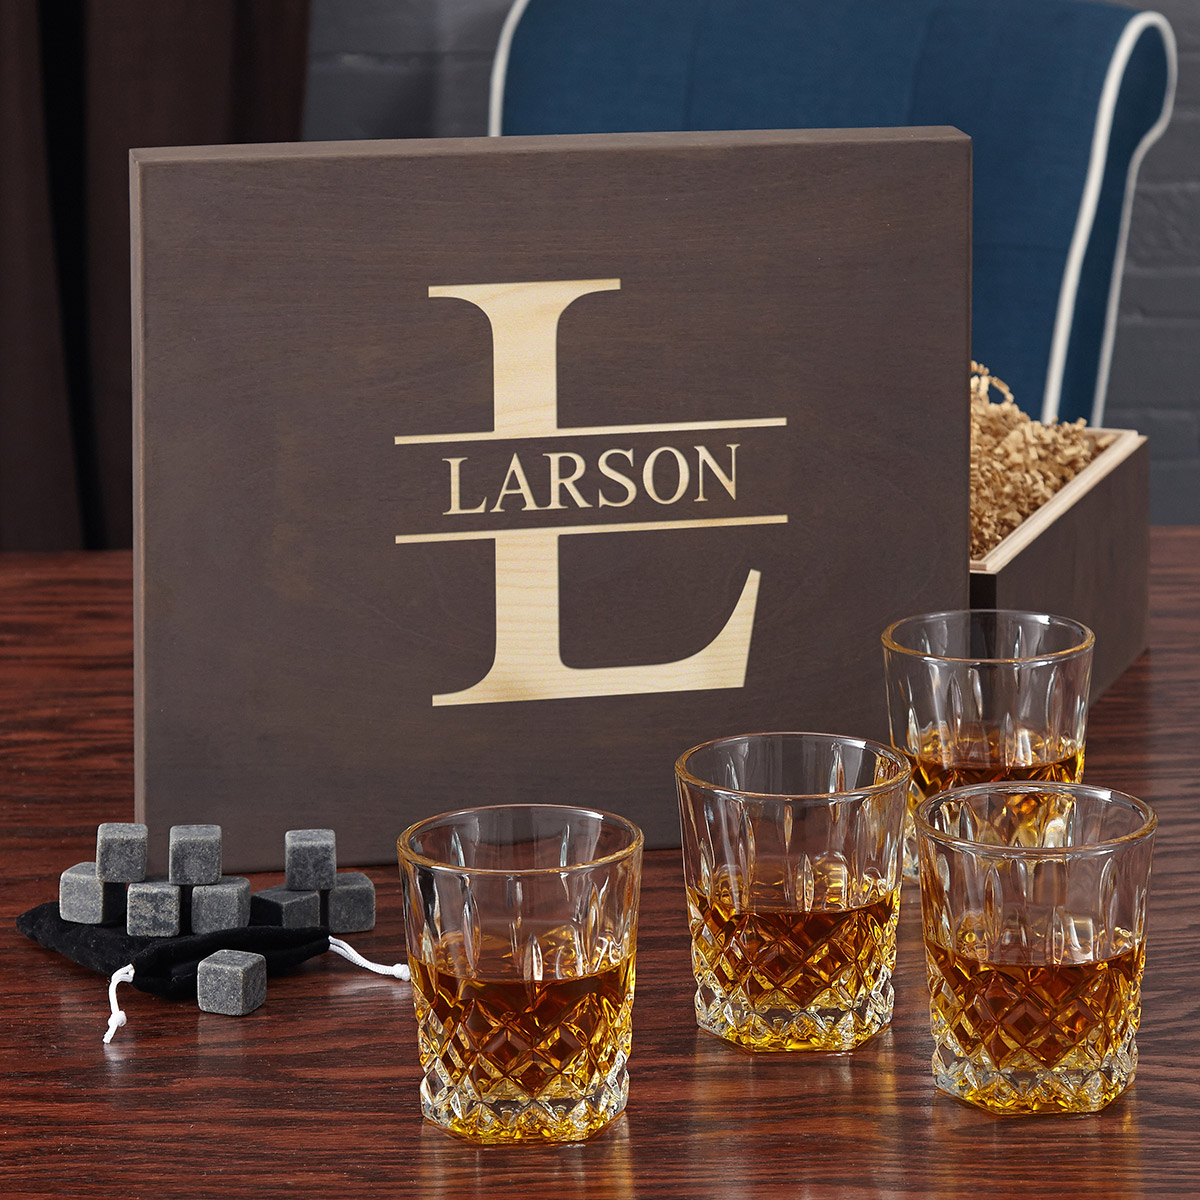 Oakmont Whiskey Lovers Gift Set with Personalized Wood Box